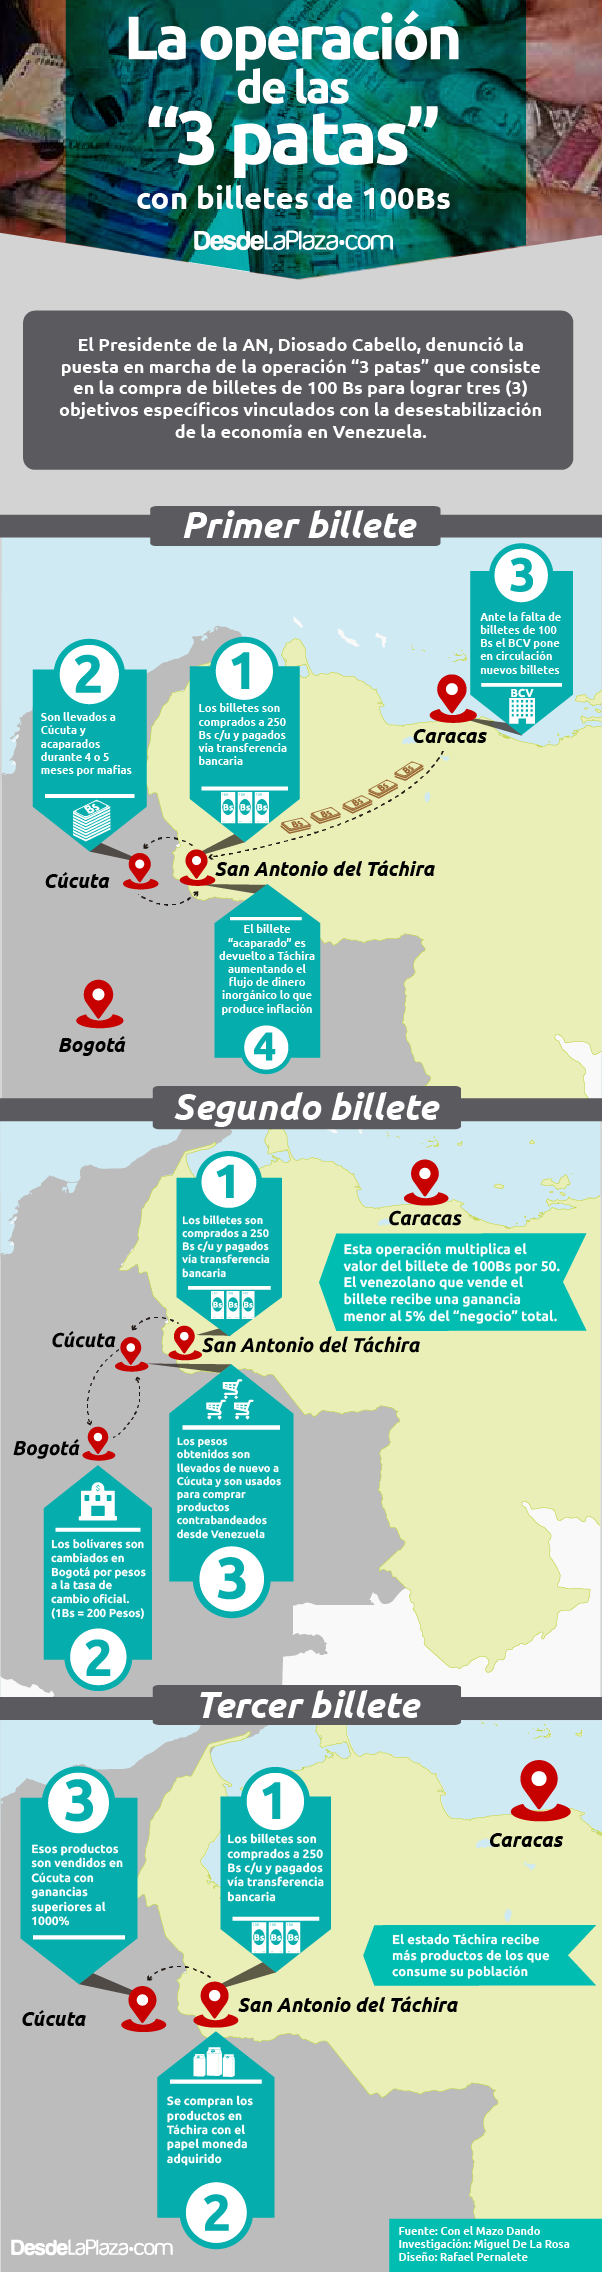 infografia-operacion-tres-patas-billetes-100-1